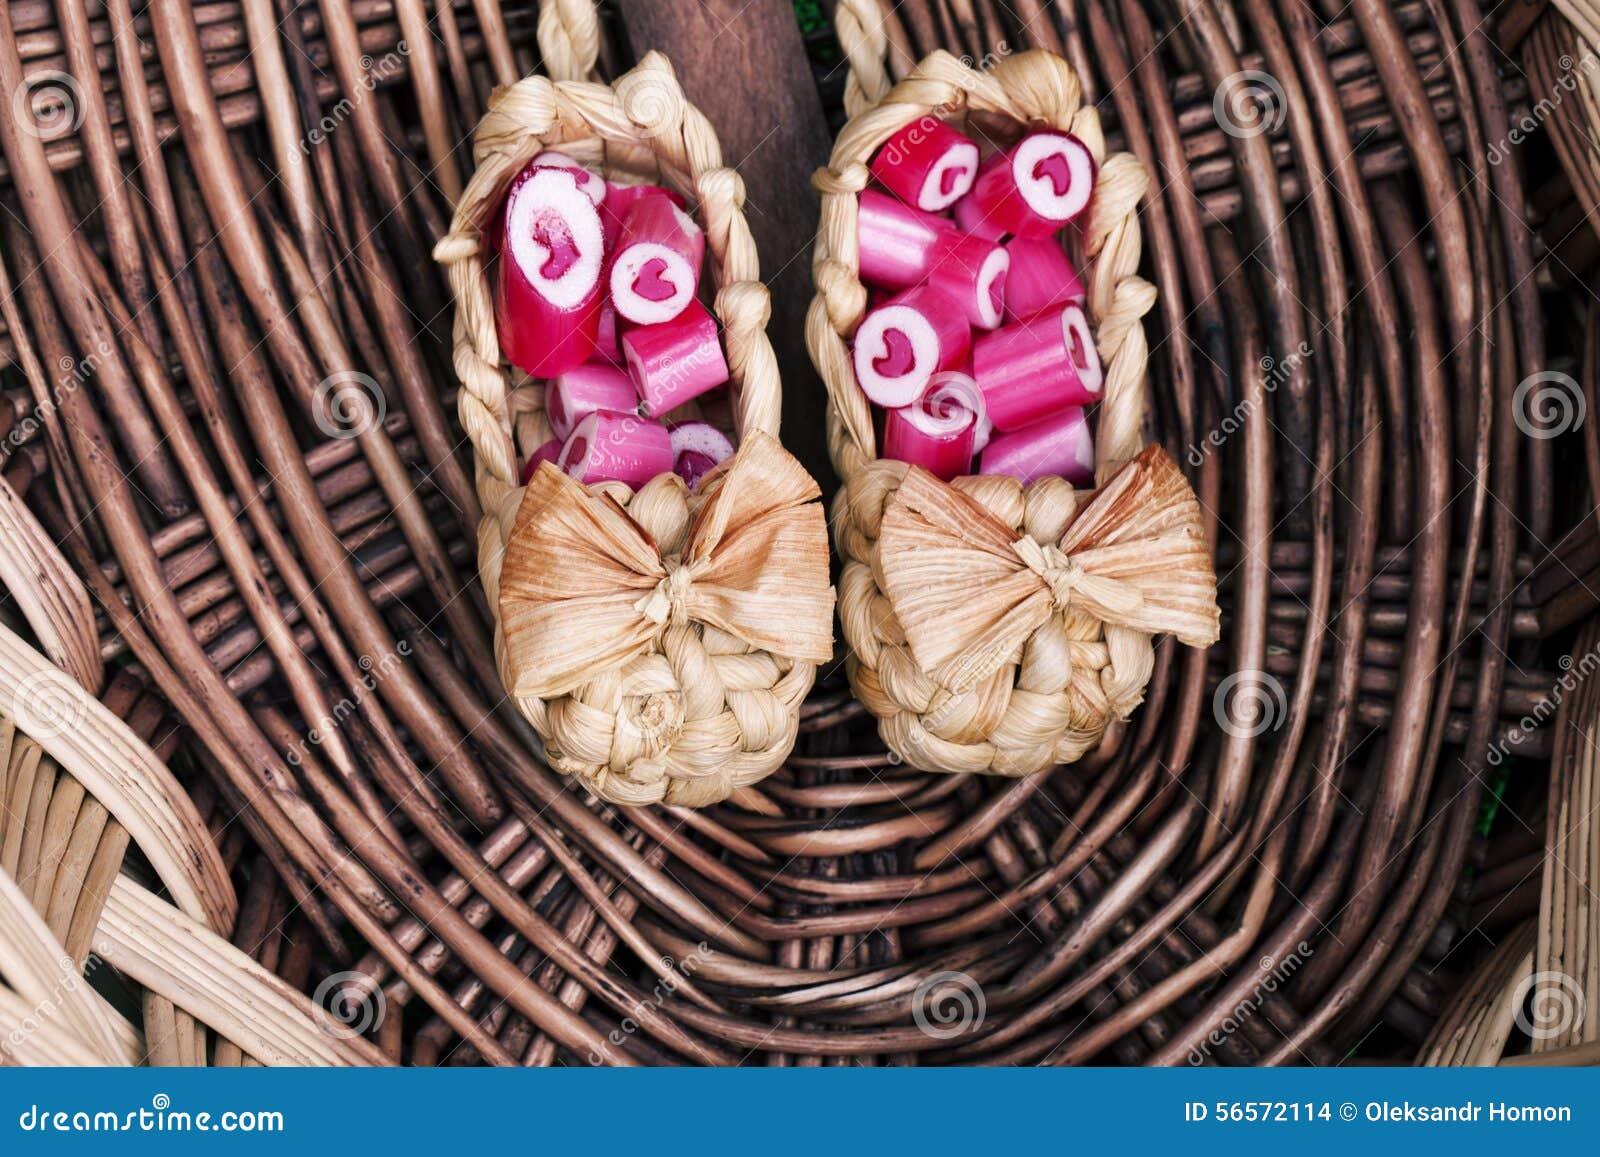 Download Καλοί κάλαμοι καραμελών καρδιών Στοκ Εικόνες - εικόνα από καραμέλα, εύγευστος: 56572114